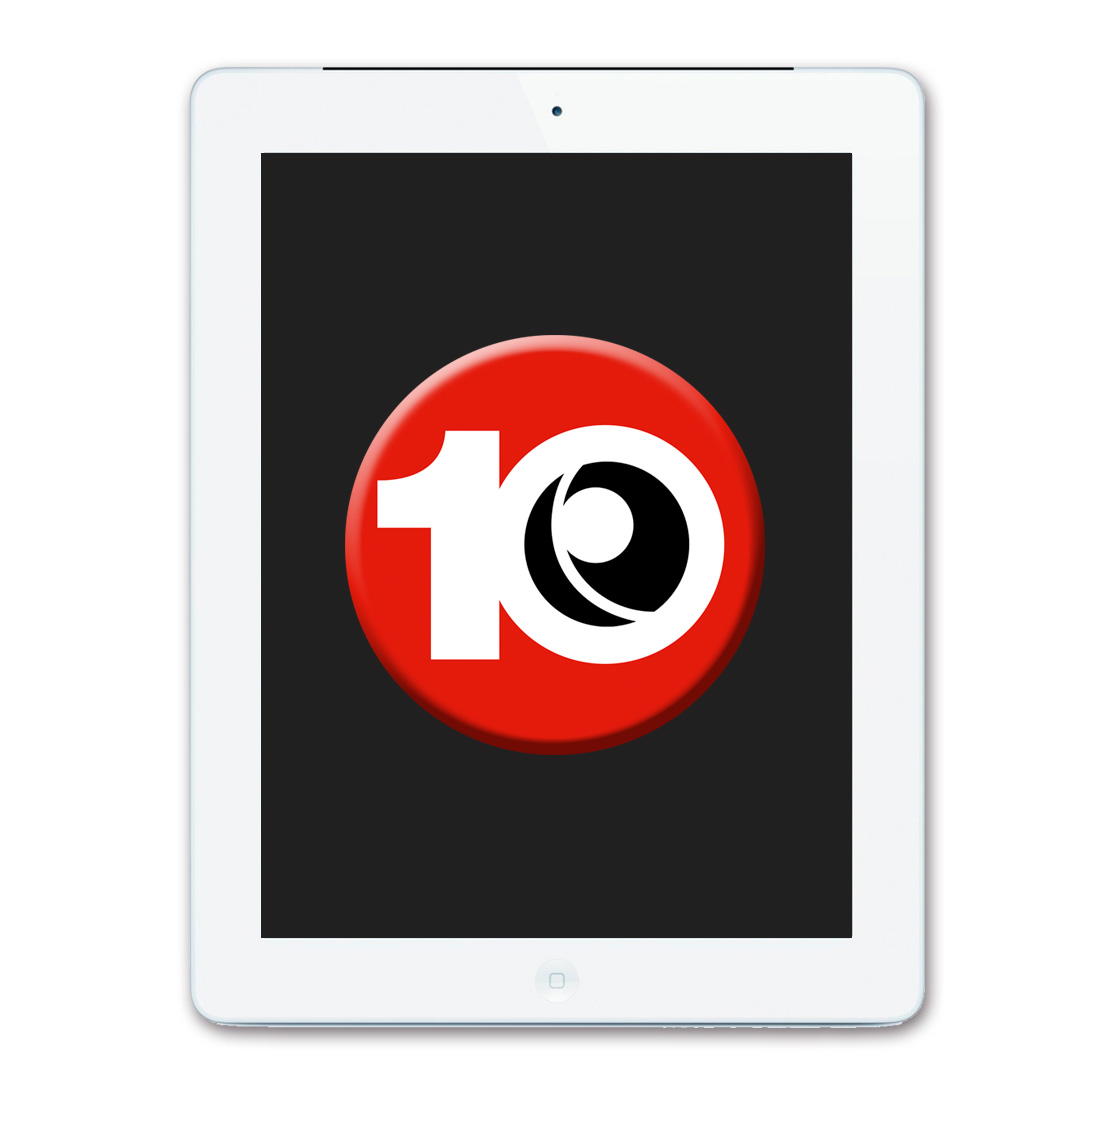 we-are-ten-logo